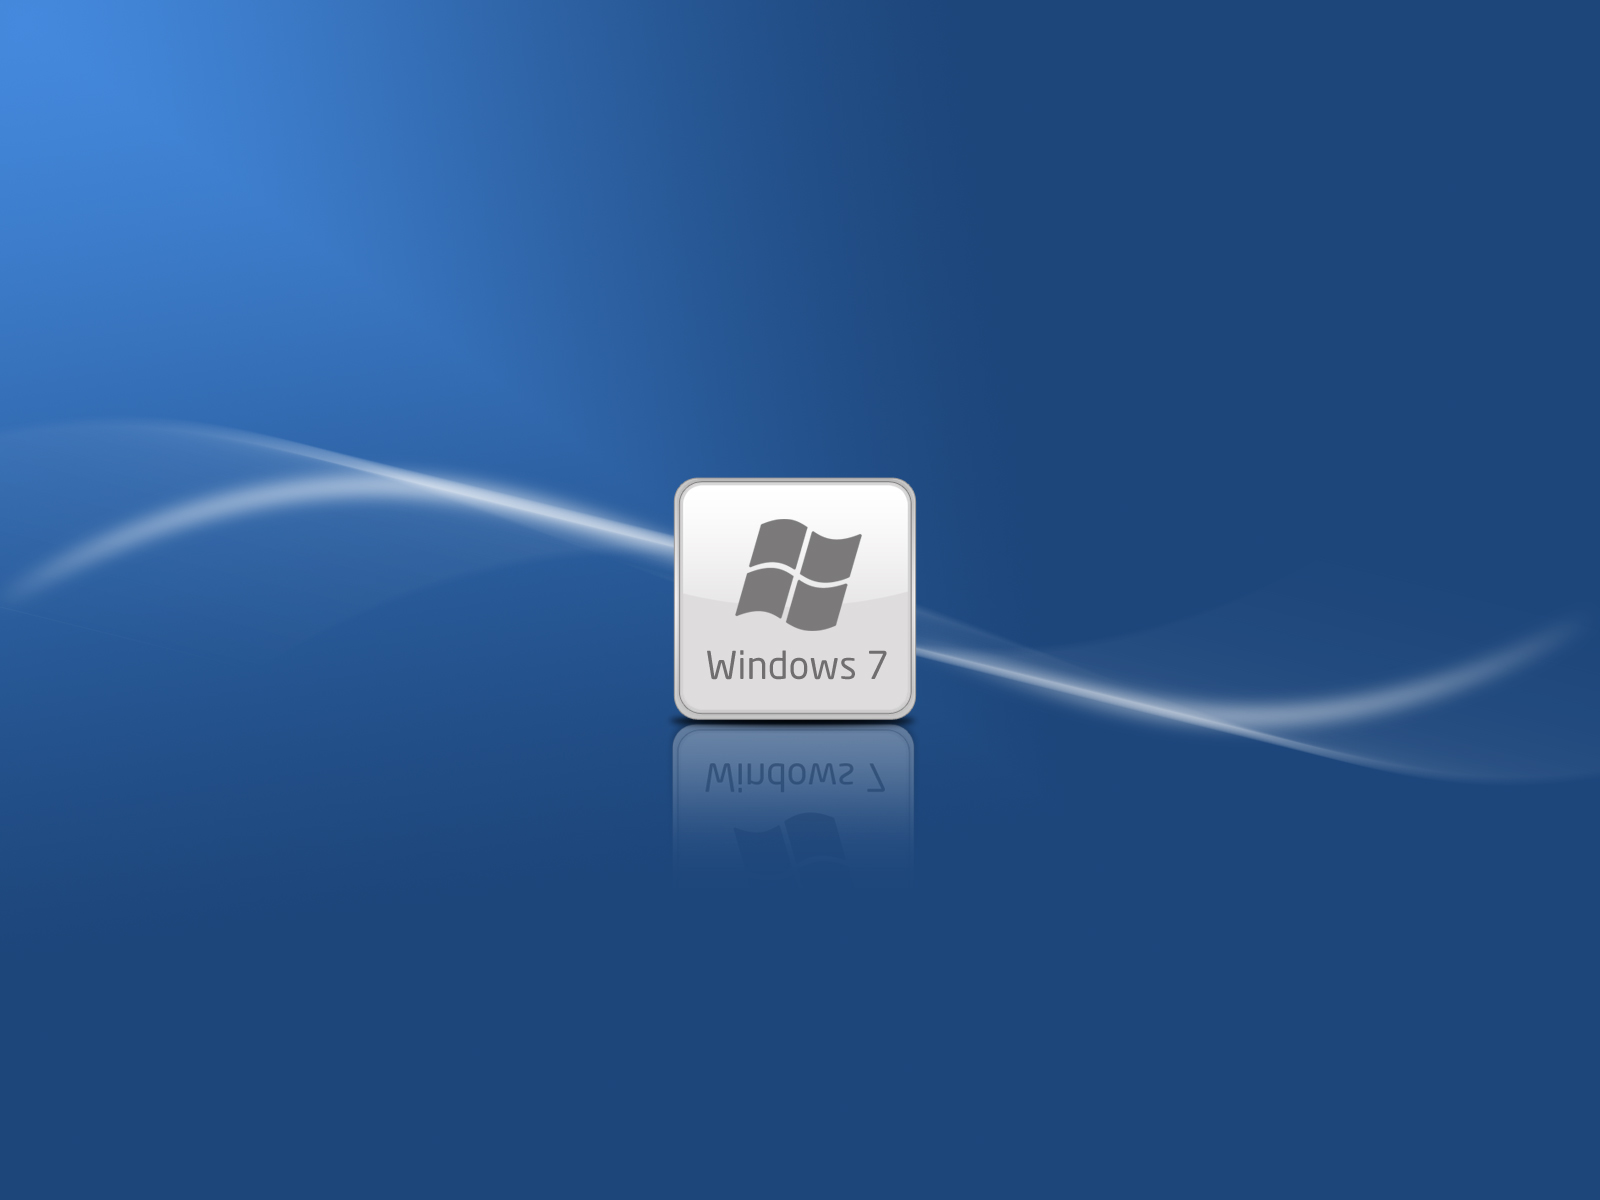 windows 7deviantarnab on deviantart